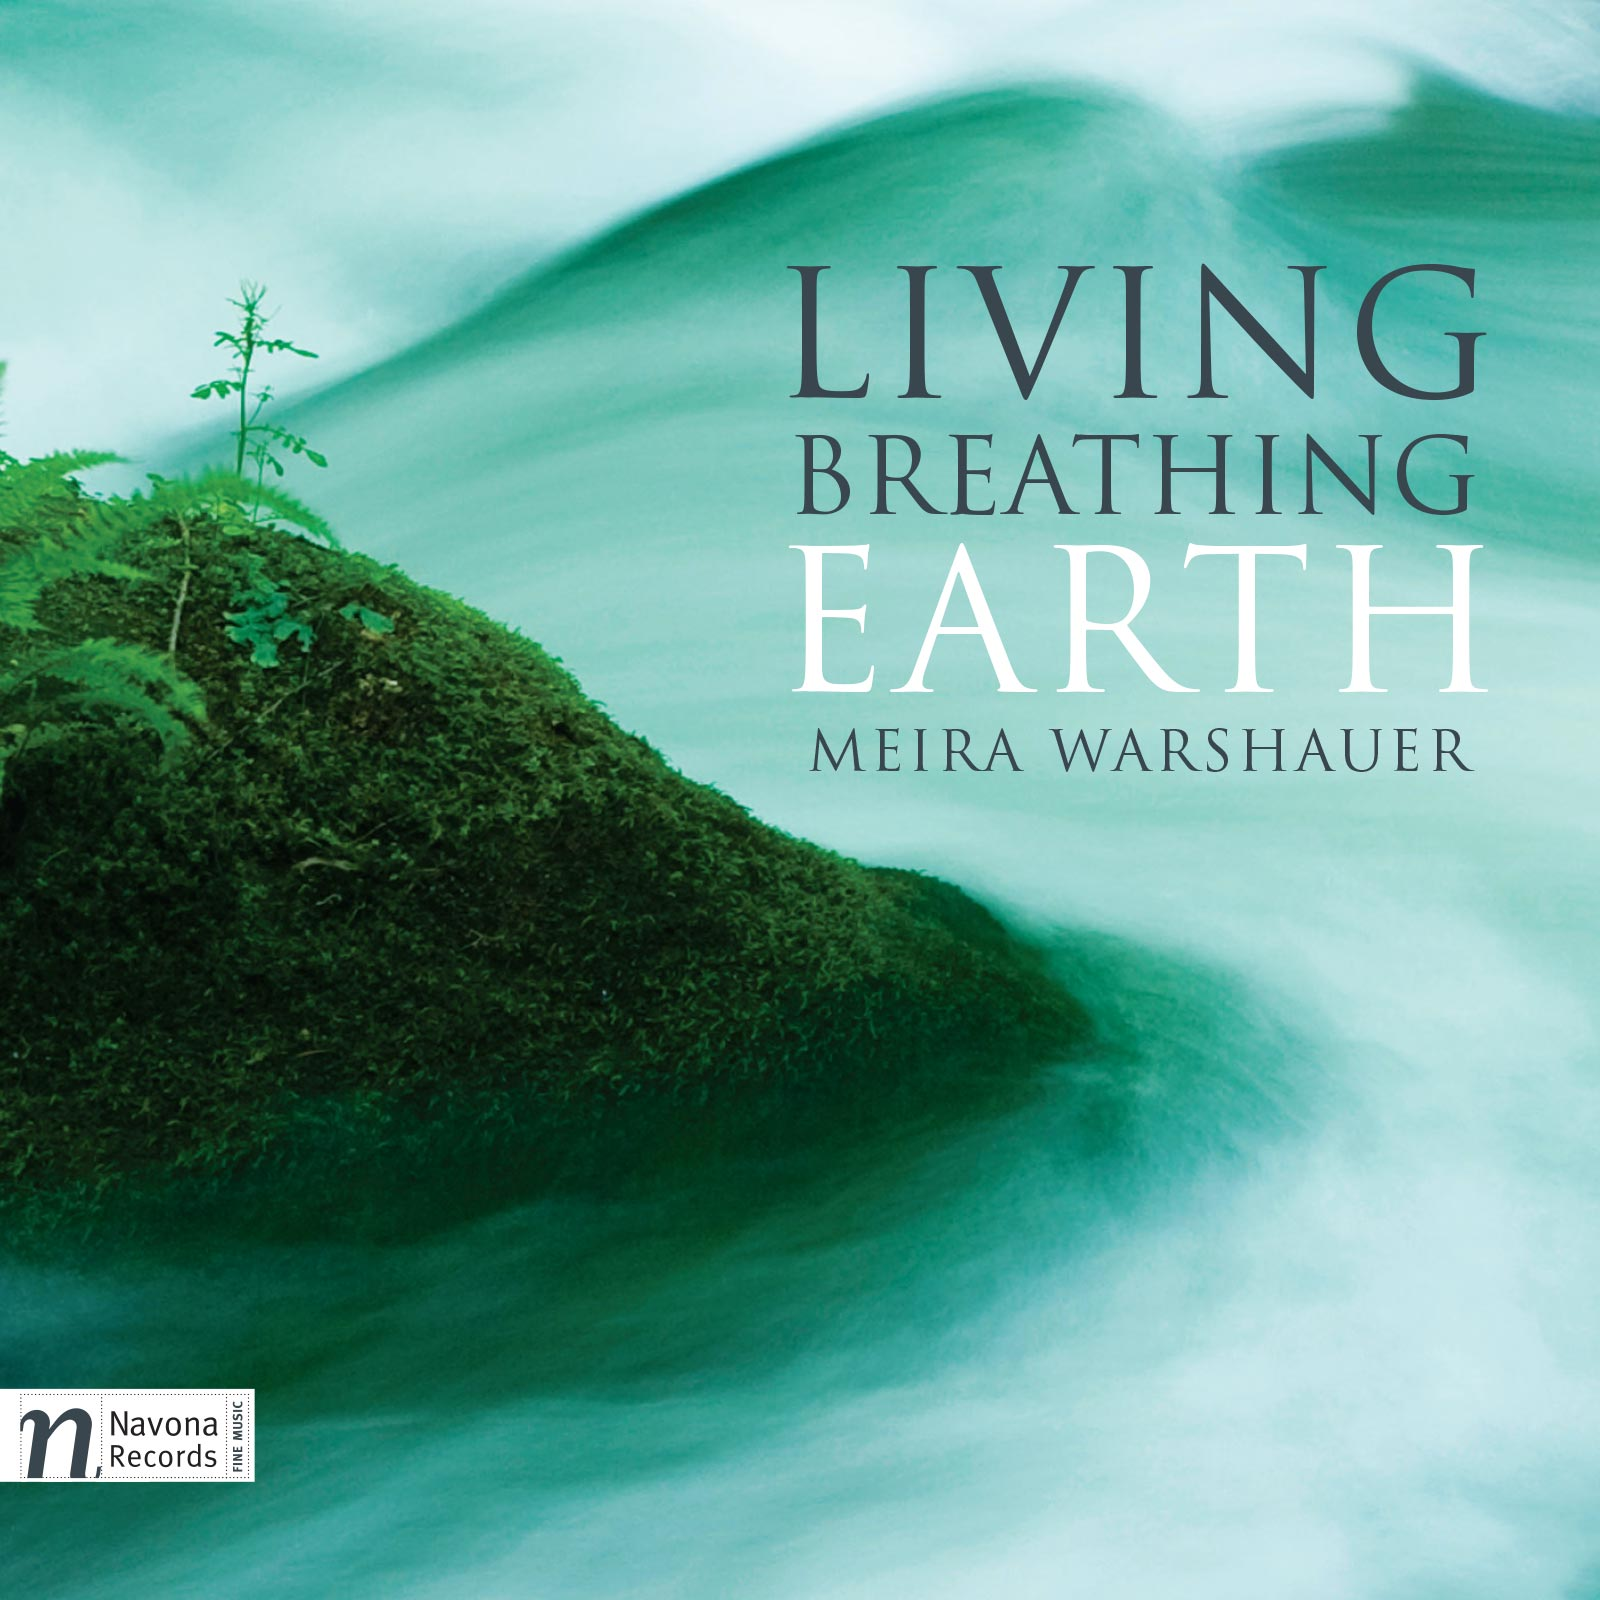 LIVING BREATHING EARTH